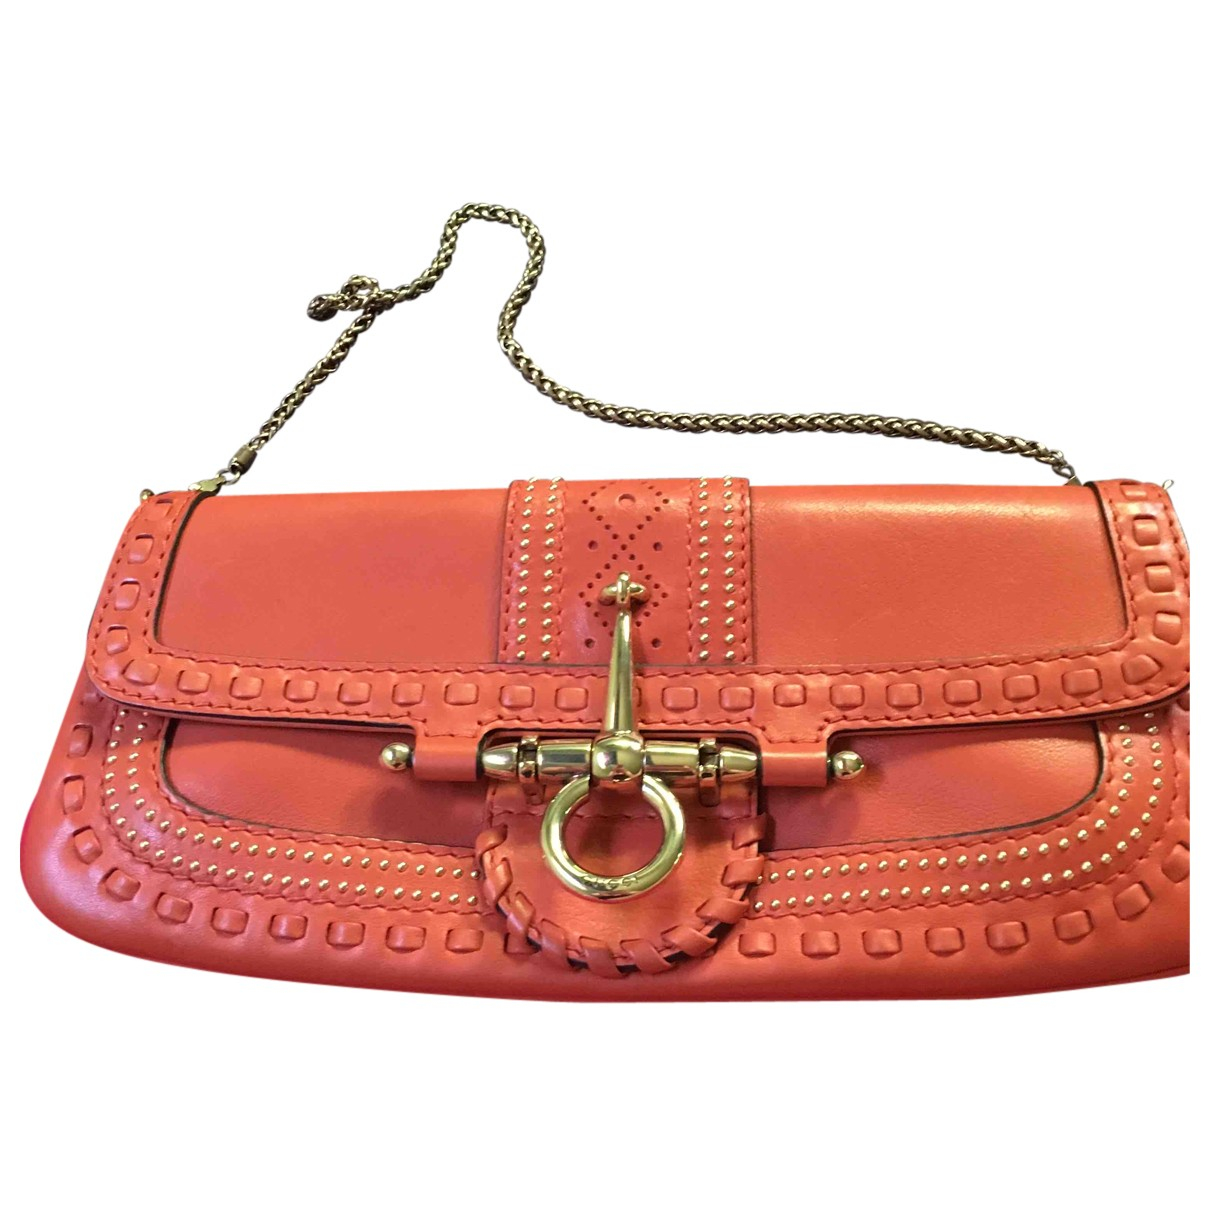 Gucci - Sac a main   pour femme en cuir - orange